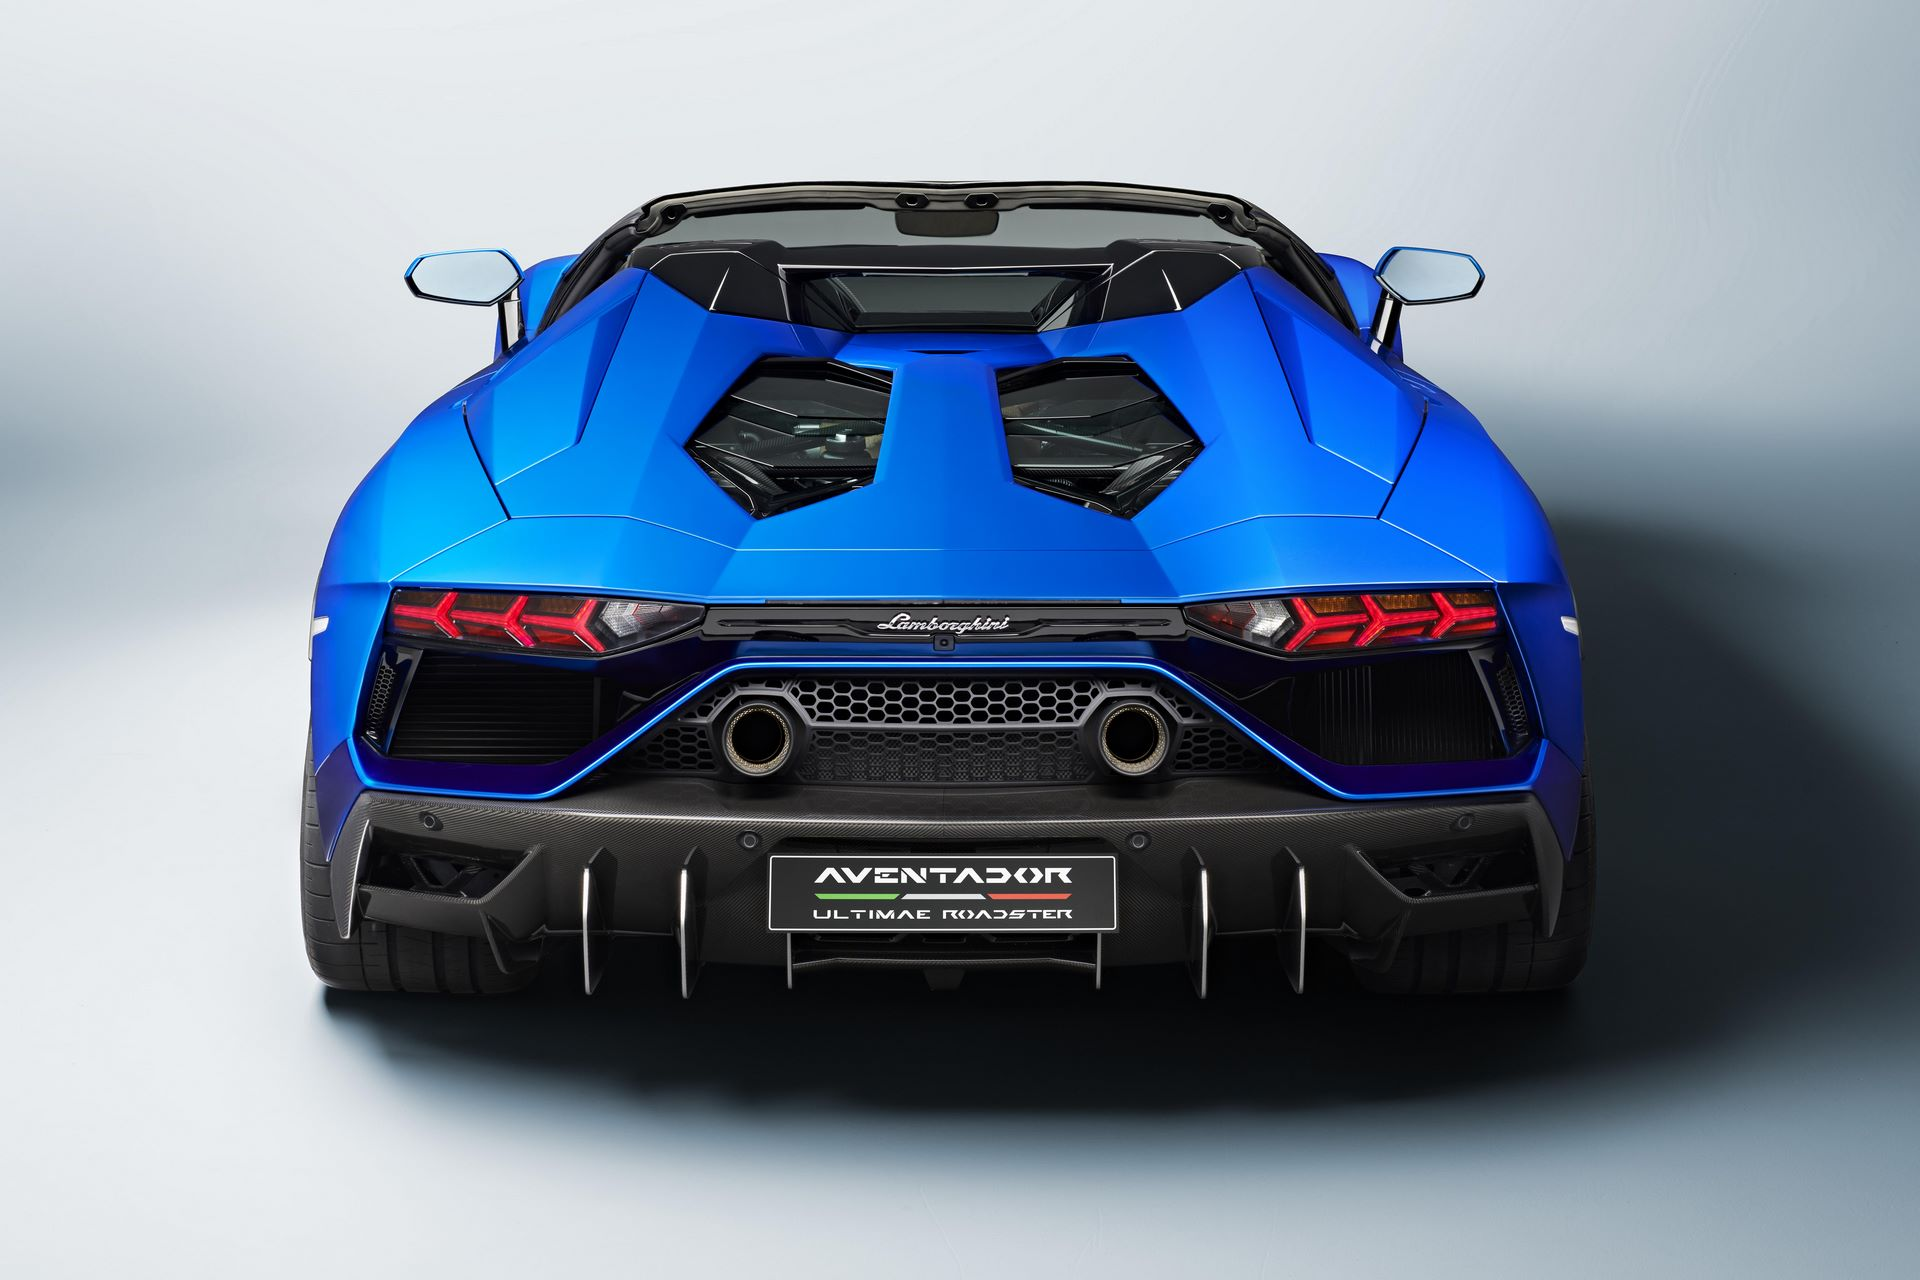 Lamborghini-Aventador-LP780-4-Ultimae-43